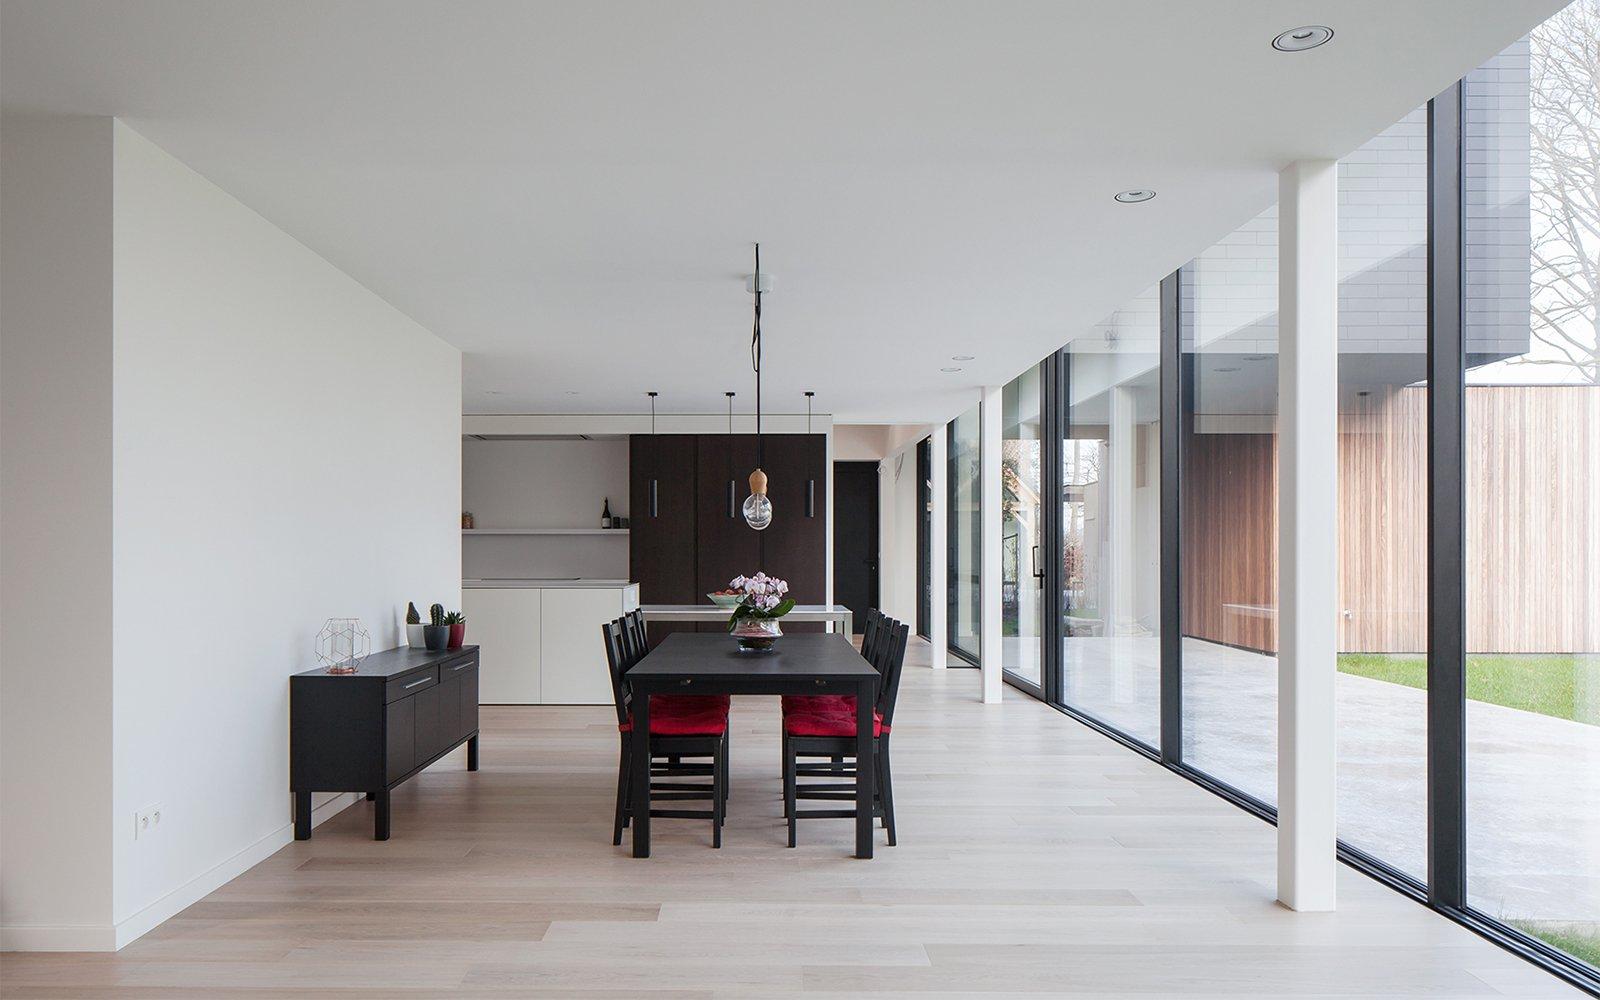 Woonkamer, houten vloer, grote ramen, lichtinval, eettafel, sfeervolle woning, Hulpia Architecten